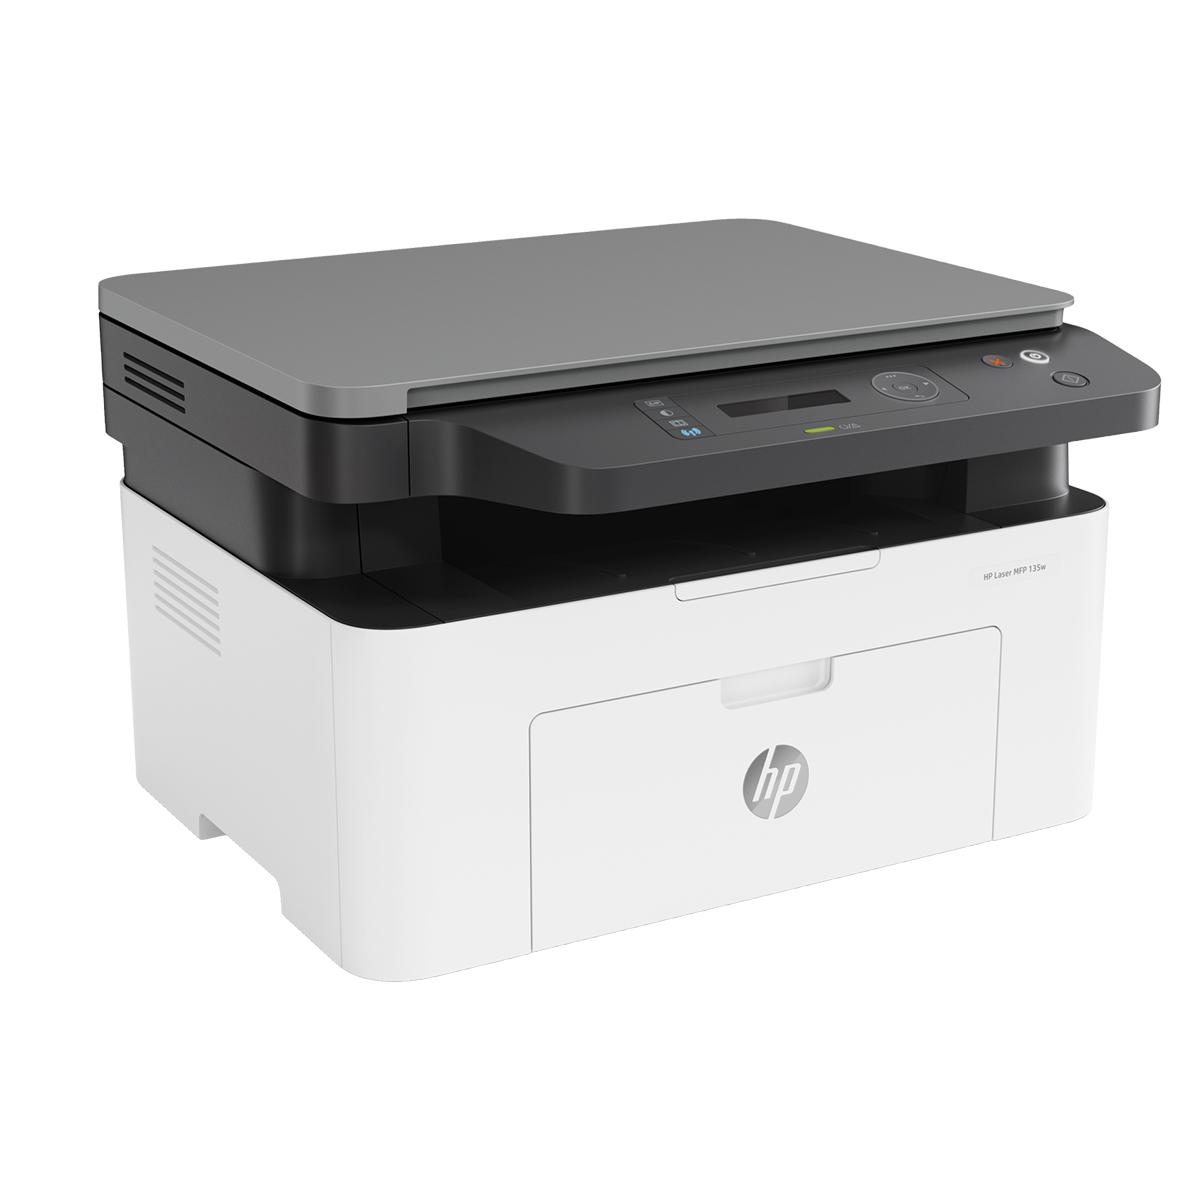 Impressora Multifuncional Hp 135a 110v - 127v Branca E Cinza